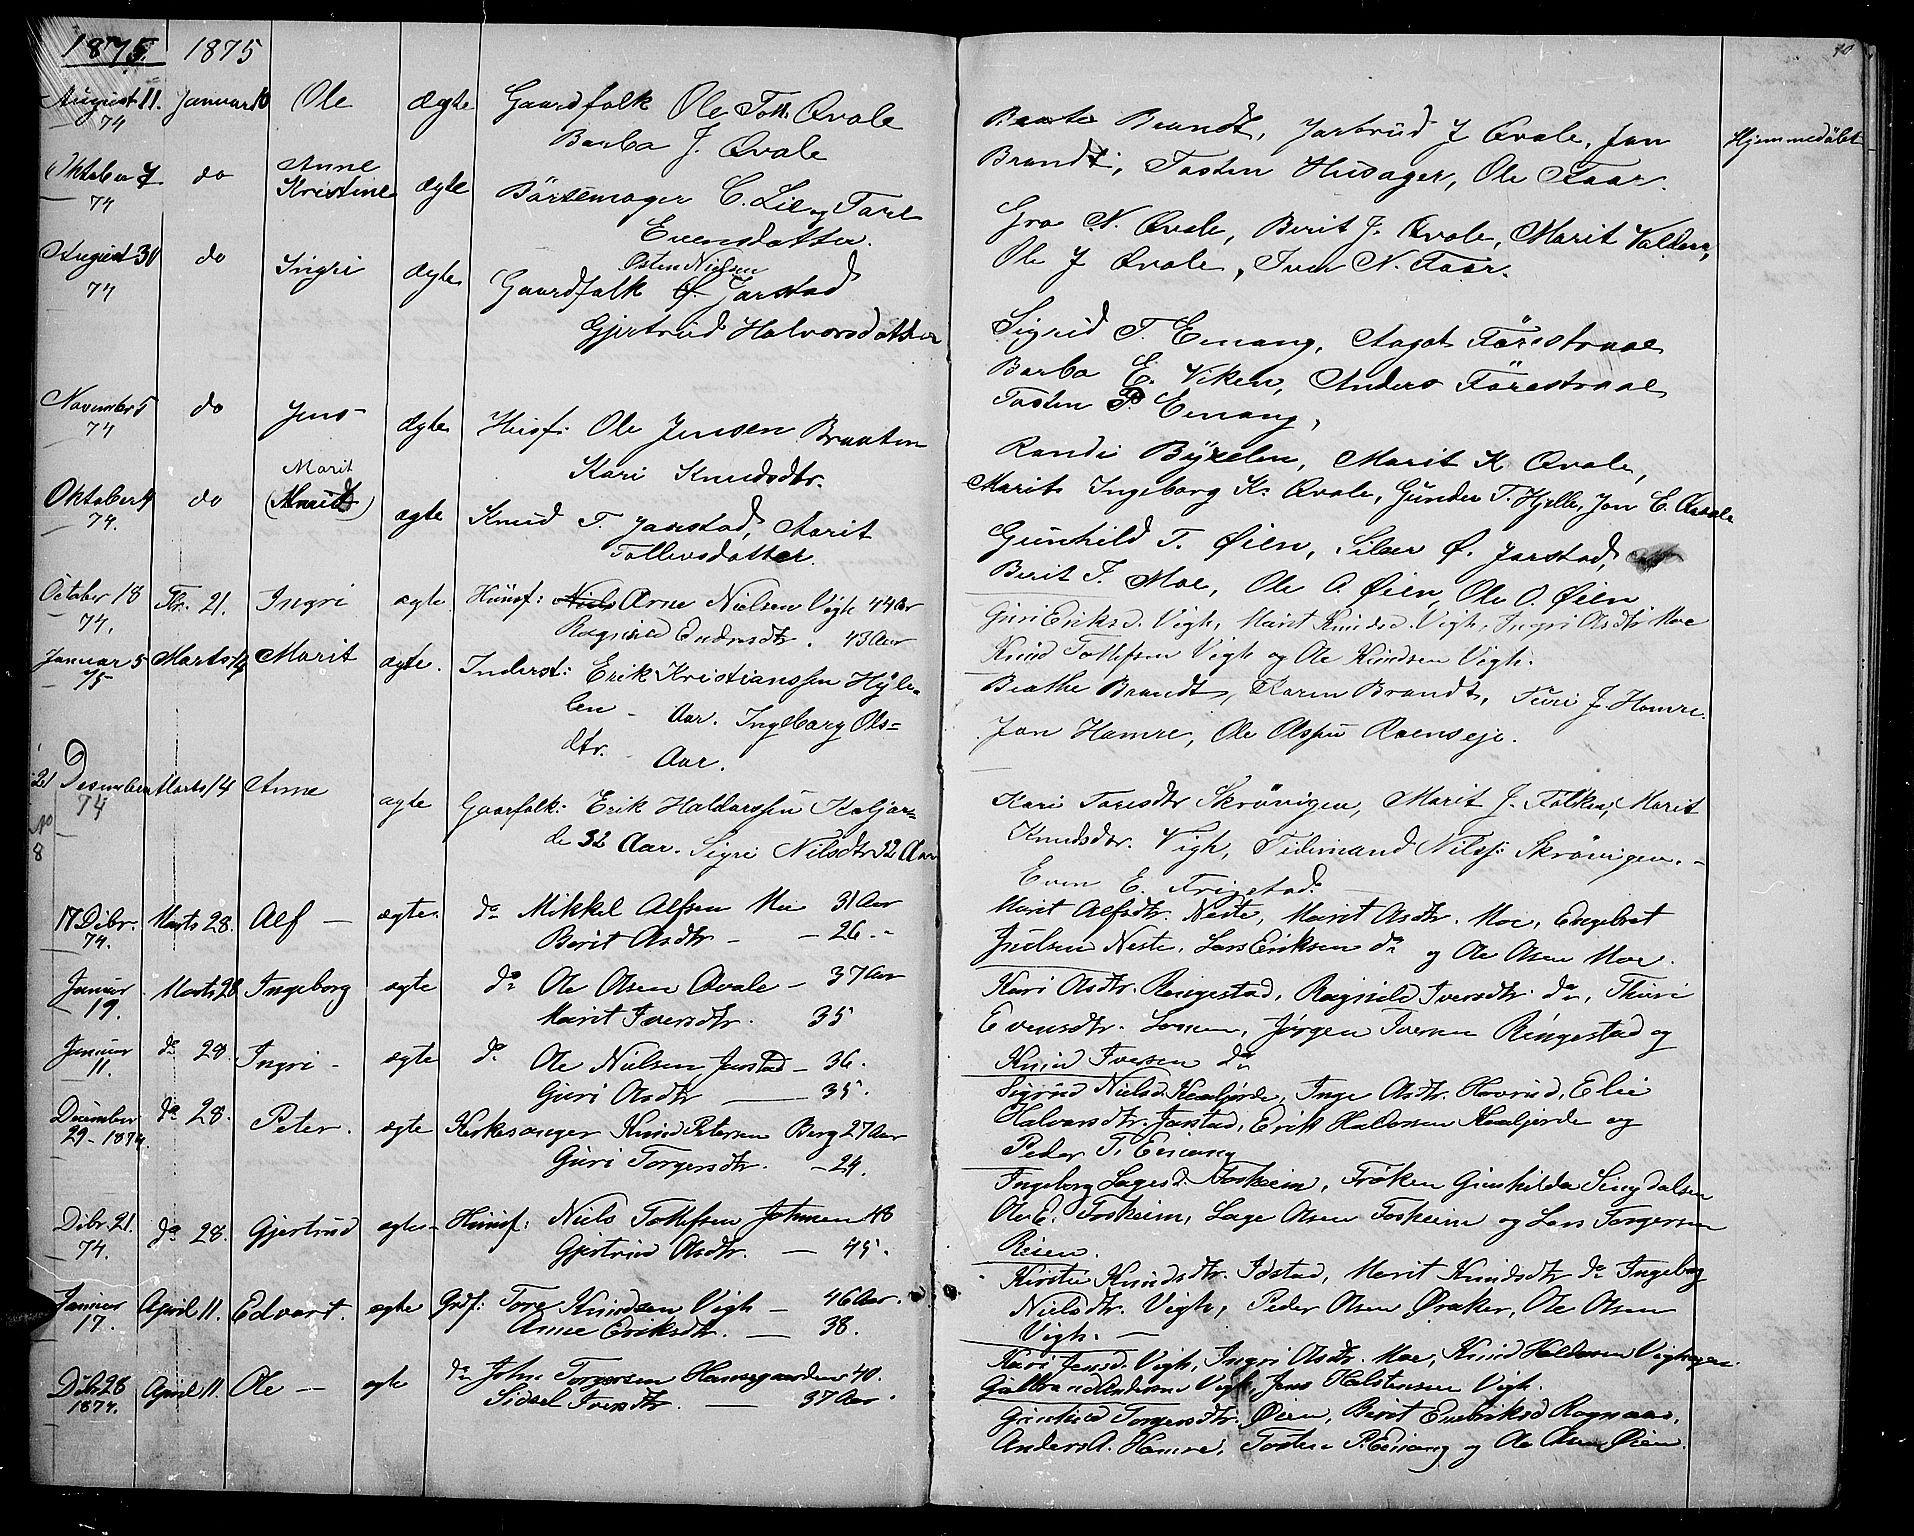 SAH, Vestre Slidre prestekontor, Klokkerbok nr. 1, 1869-1882, s. 10